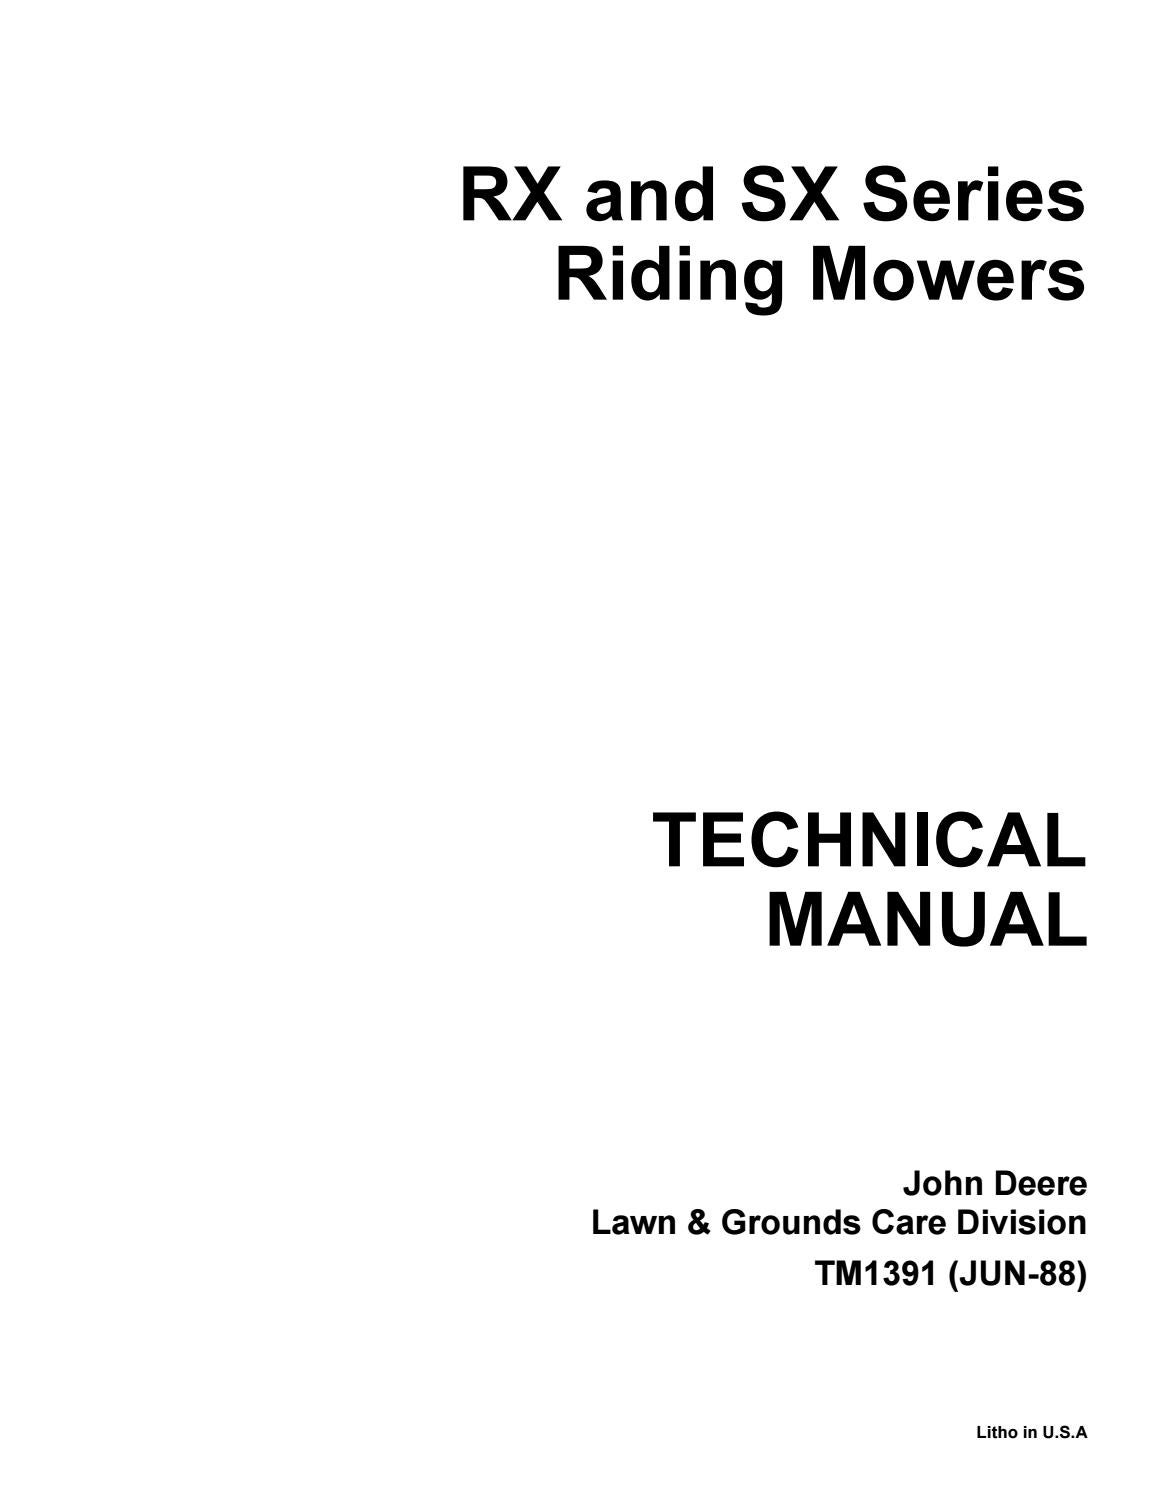 JOHN DEERE SX95 RIDING MOWER Service Repair Manual by 1639610 - issuuIssuu